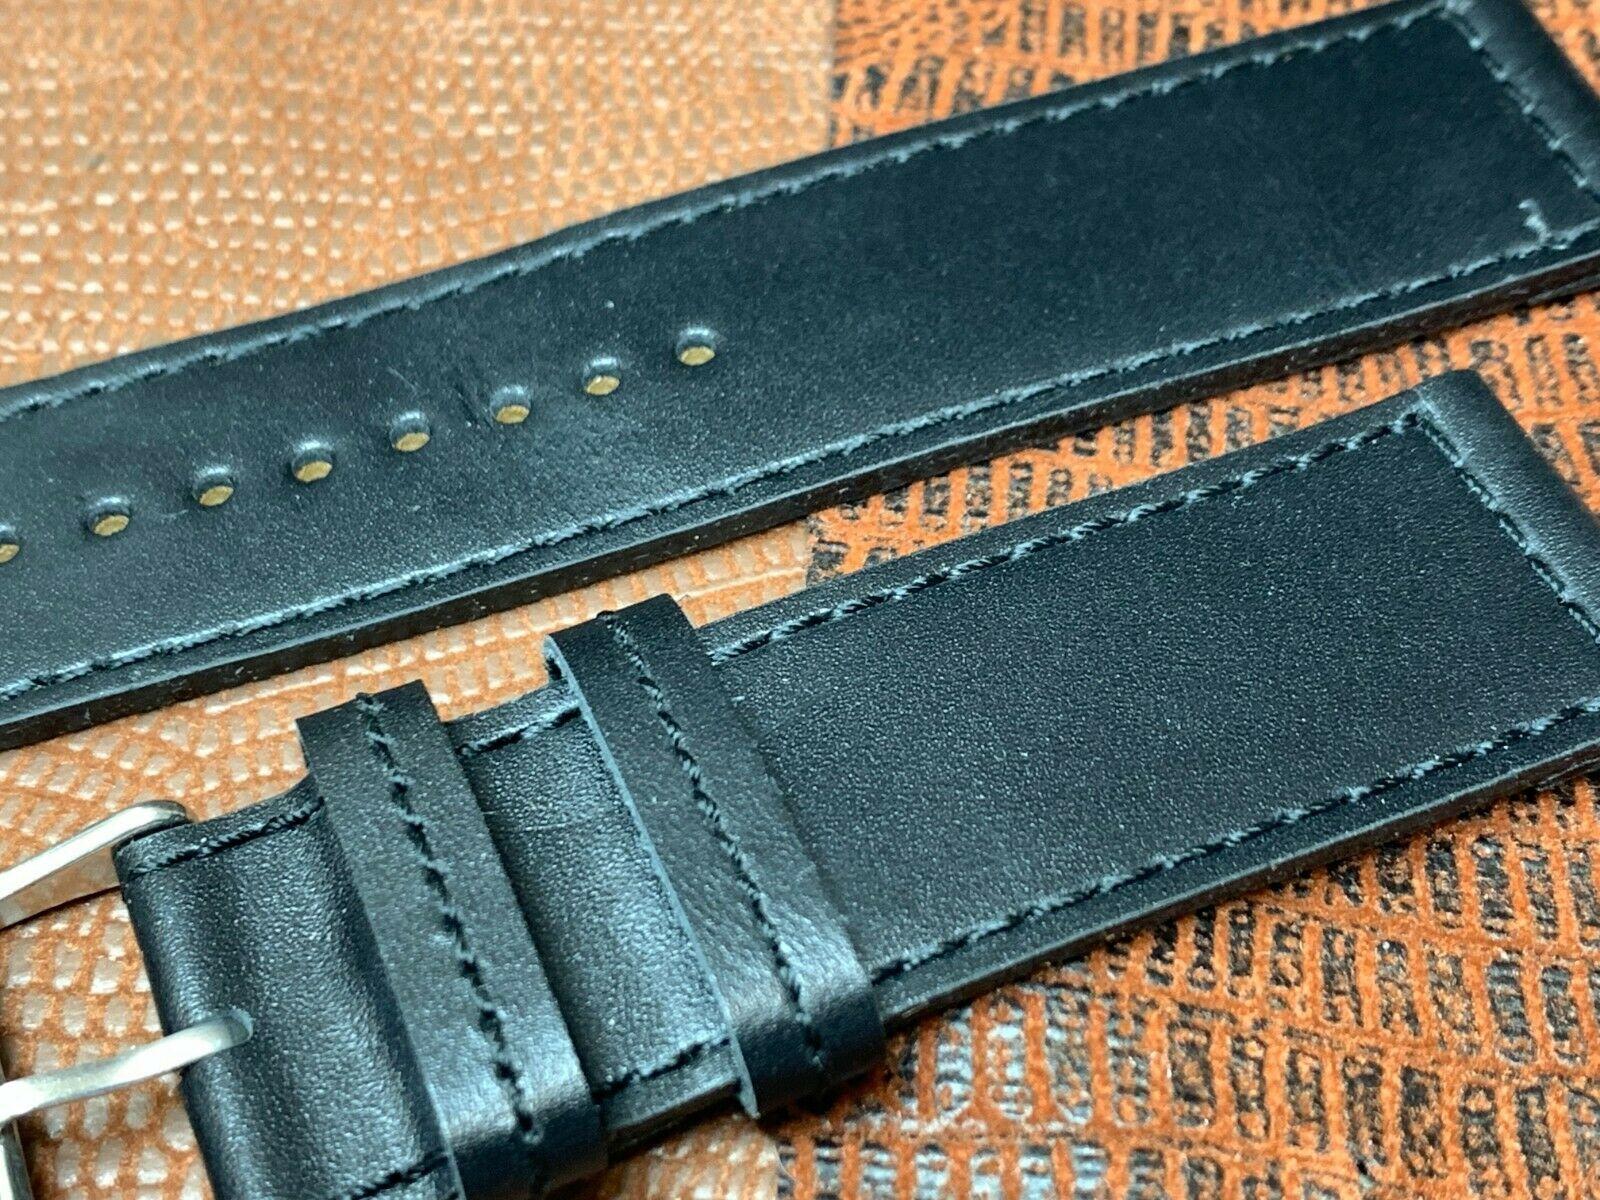 24mm Italian genuine leather watch band   Black Premium calf fit Panerai